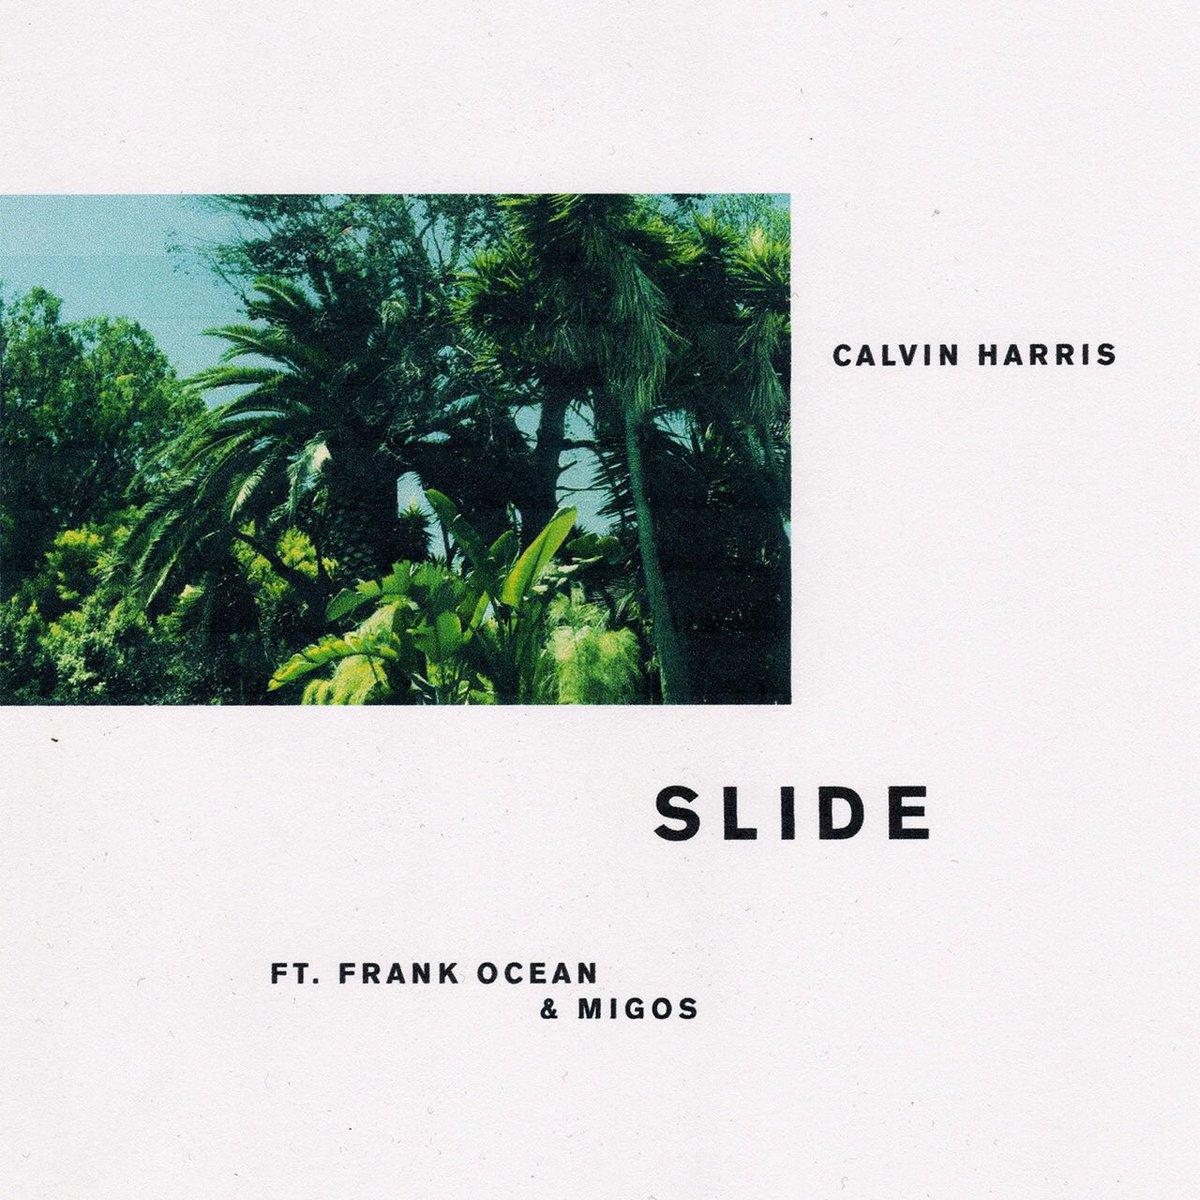 Calvin Harris - Slide Lyrics ft. Frank Ocean & Migos 2